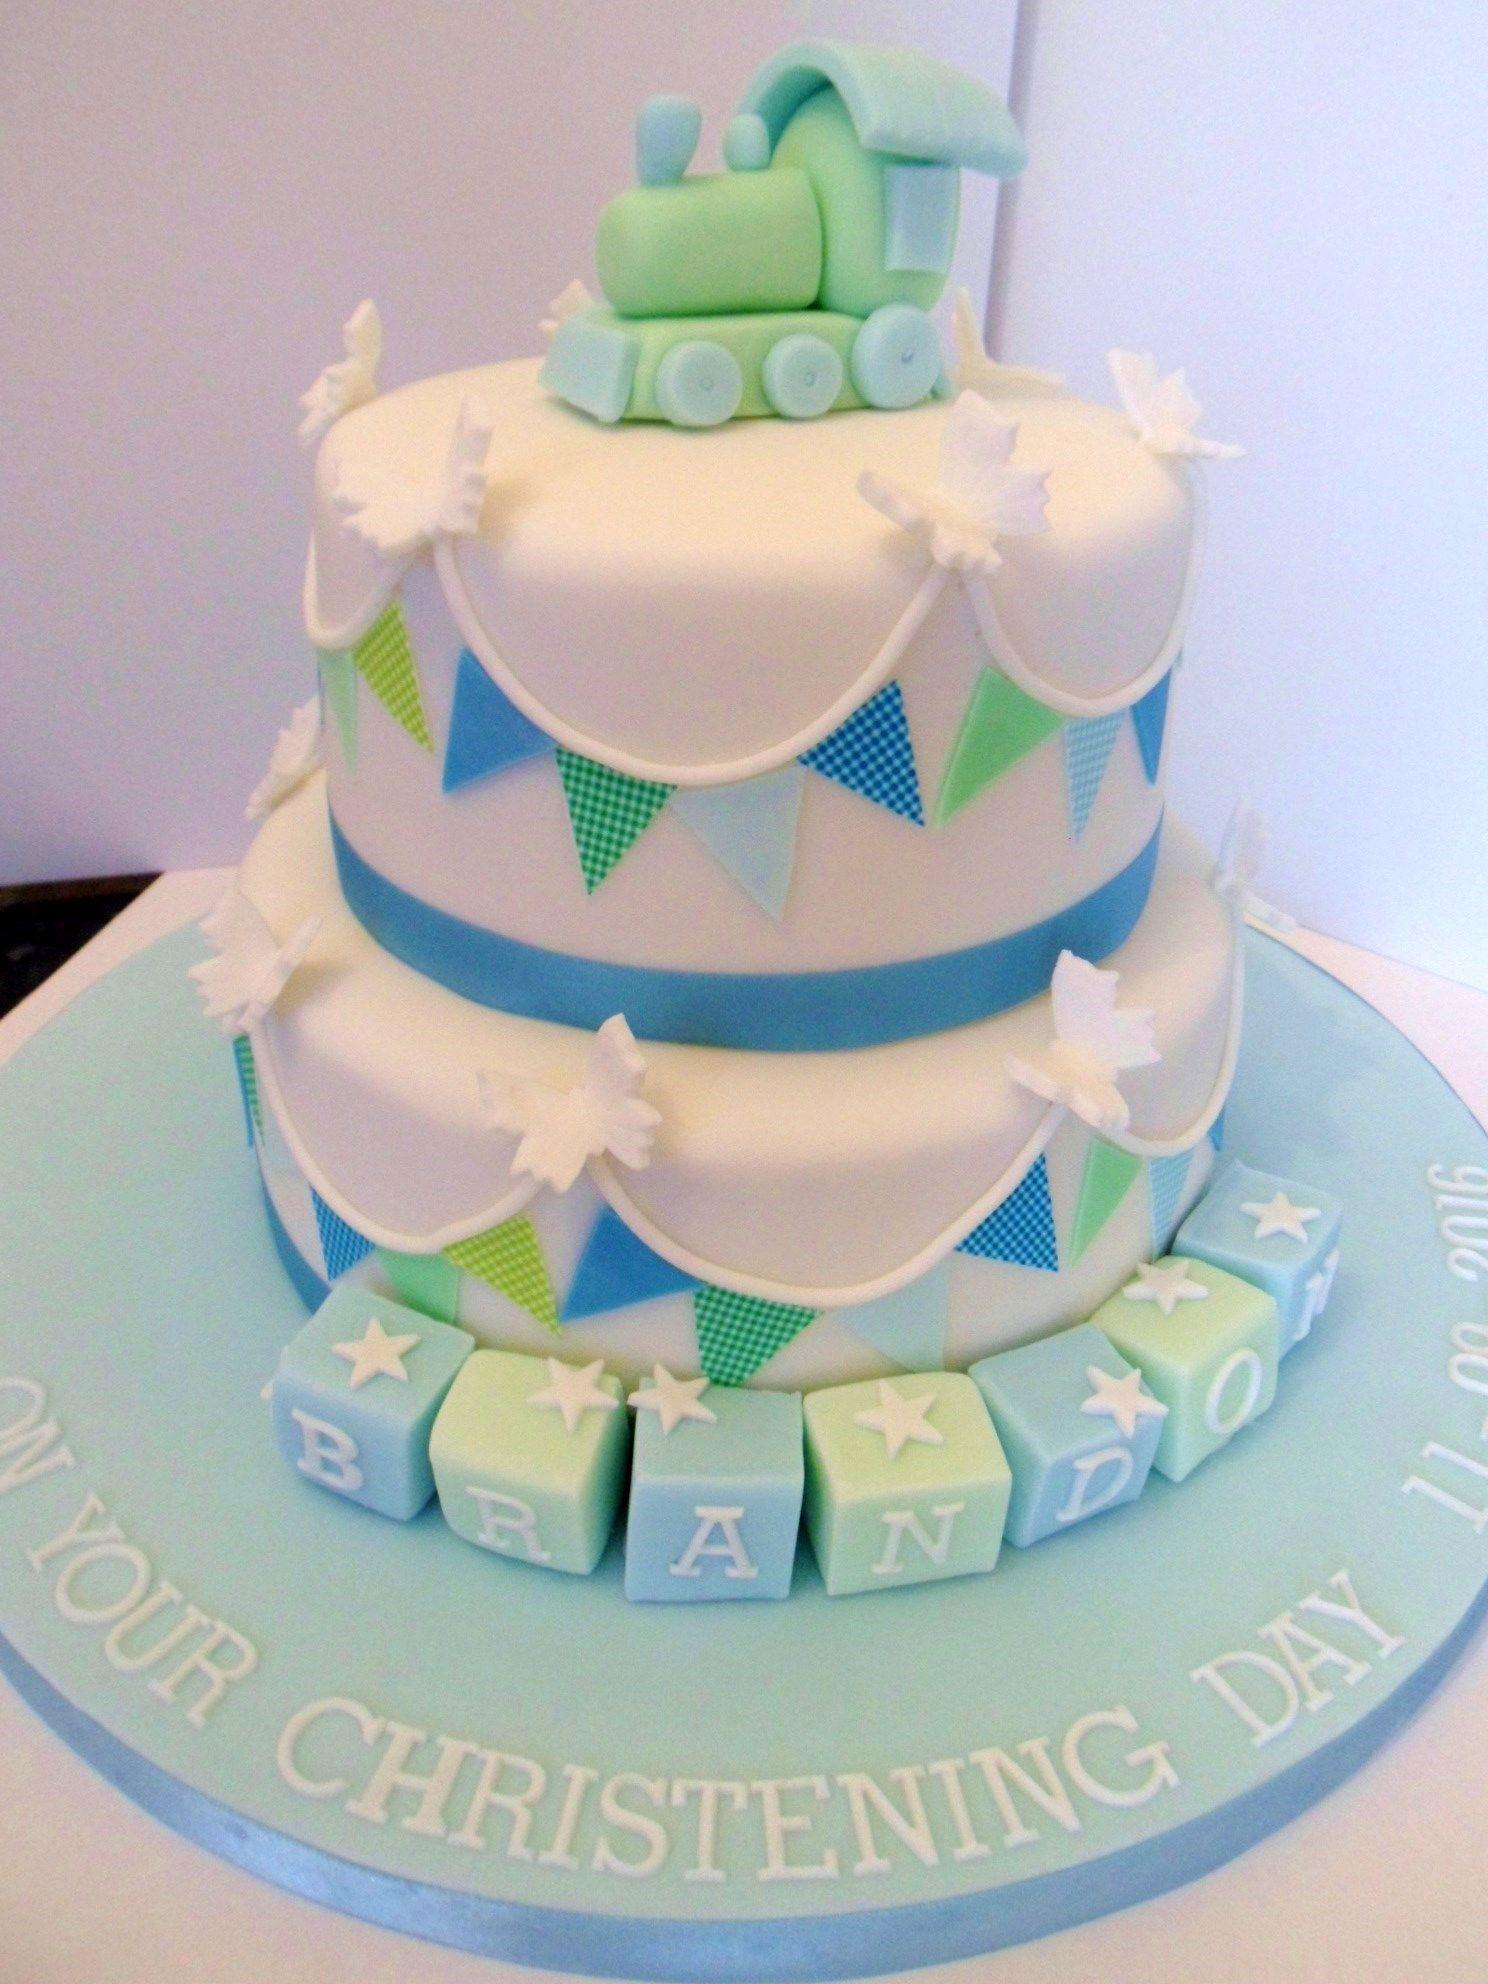 Surprising Boys 2 Tier Christening Cake With Images Cake Cake Creations Personalised Birthday Cards Veneteletsinfo